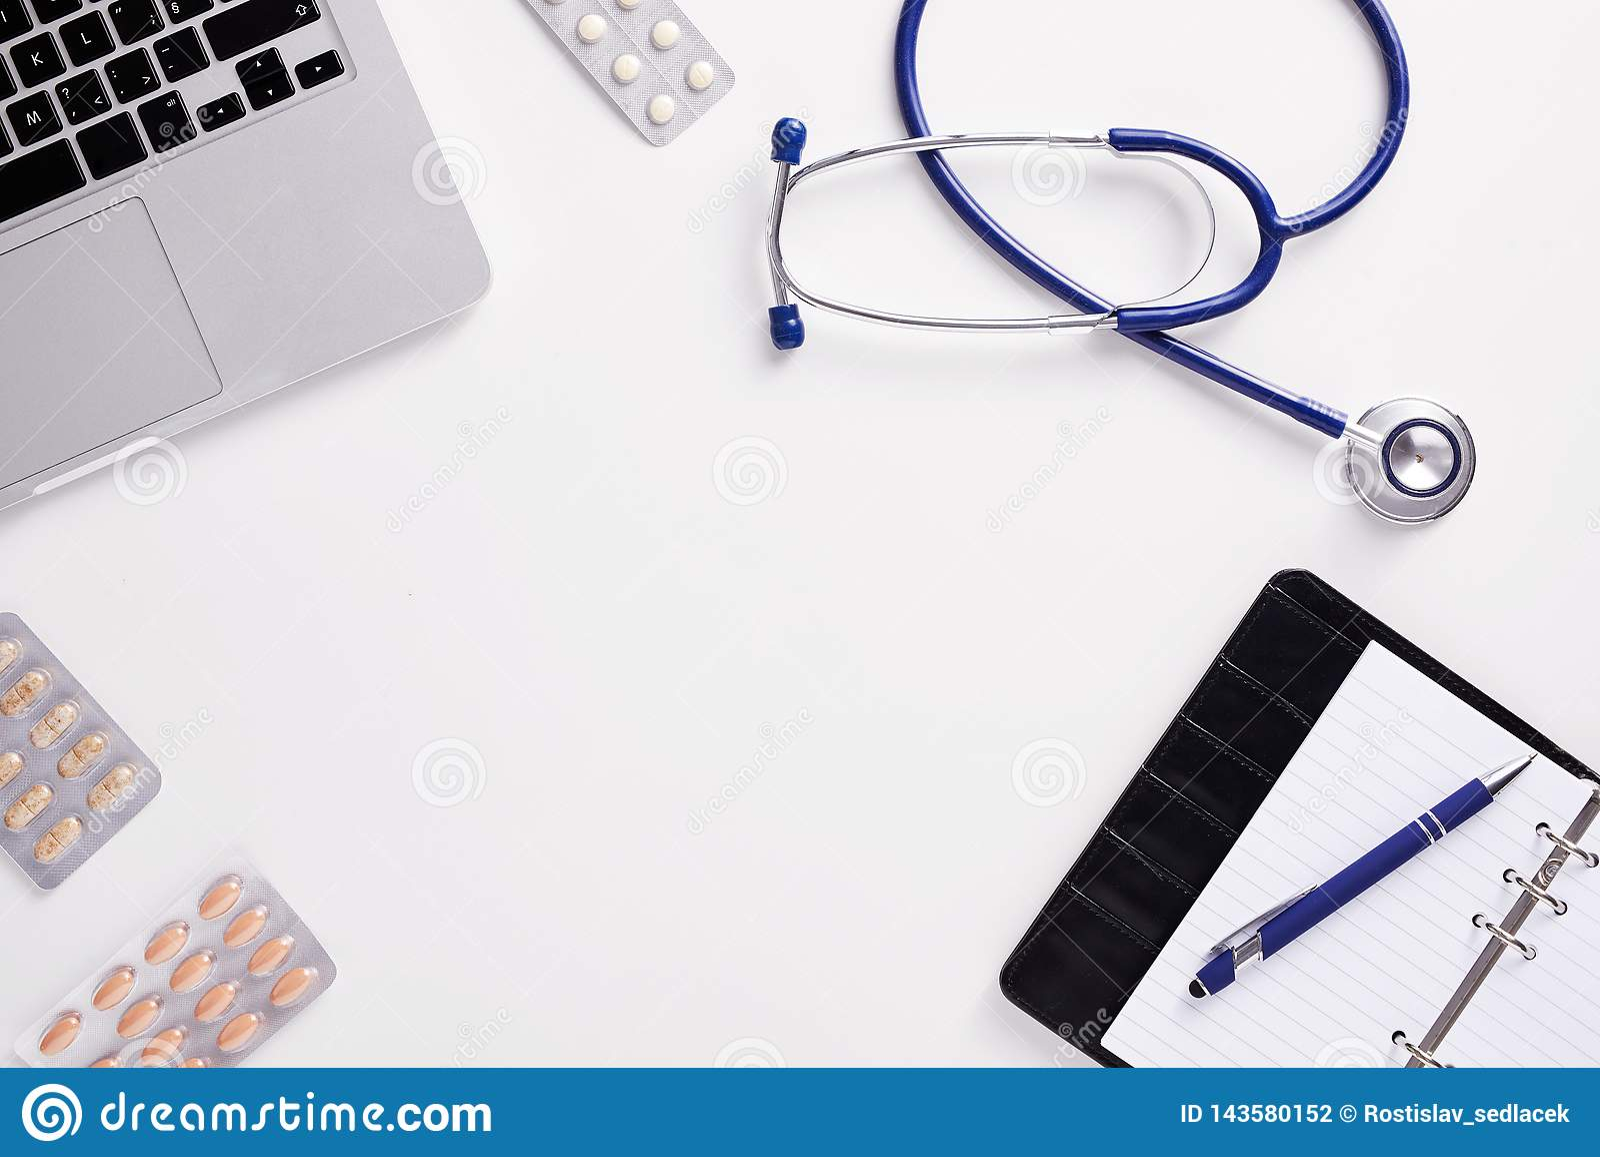 Mesa médica com estetoscópio, latptop, comprimidos e papel vazio na prancheta